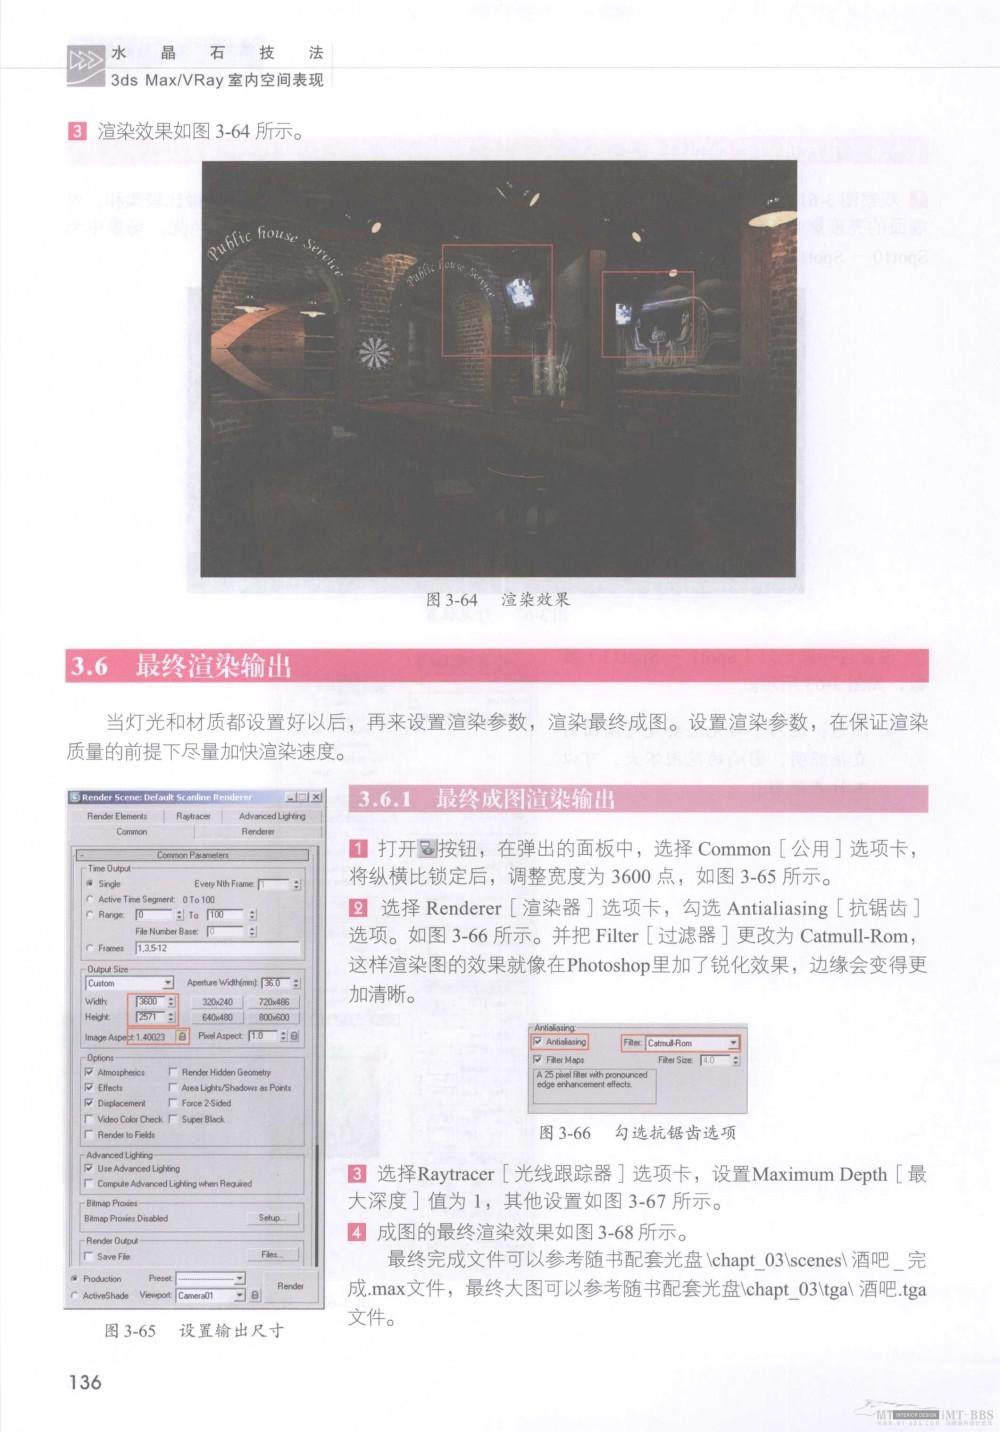 水晶石技法-3ds_Max&VRay室内空间表现_水晶石技法-3ds_Max&VRay室内空间表现_页面_142.jpg